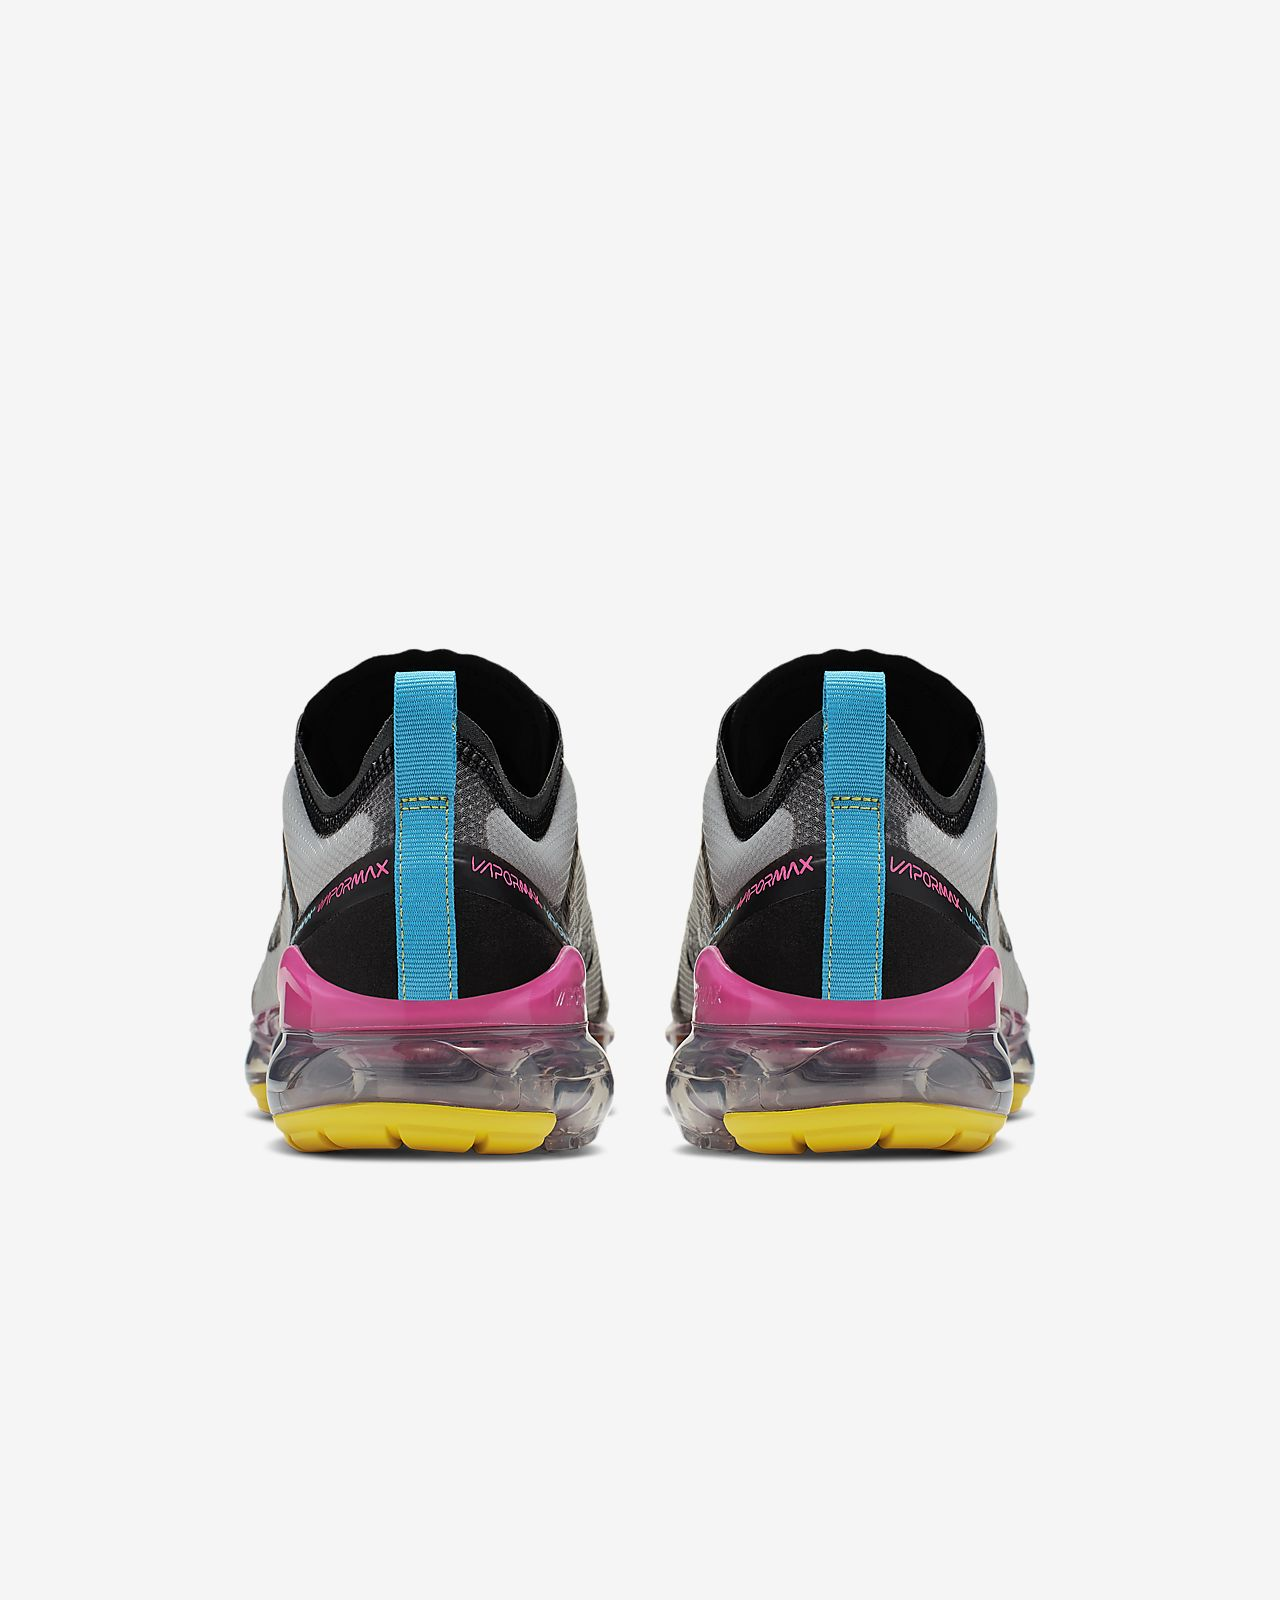 5f6c6078532f3 Nike Air VaporMax 2019 Men s Shoe. Nike.com